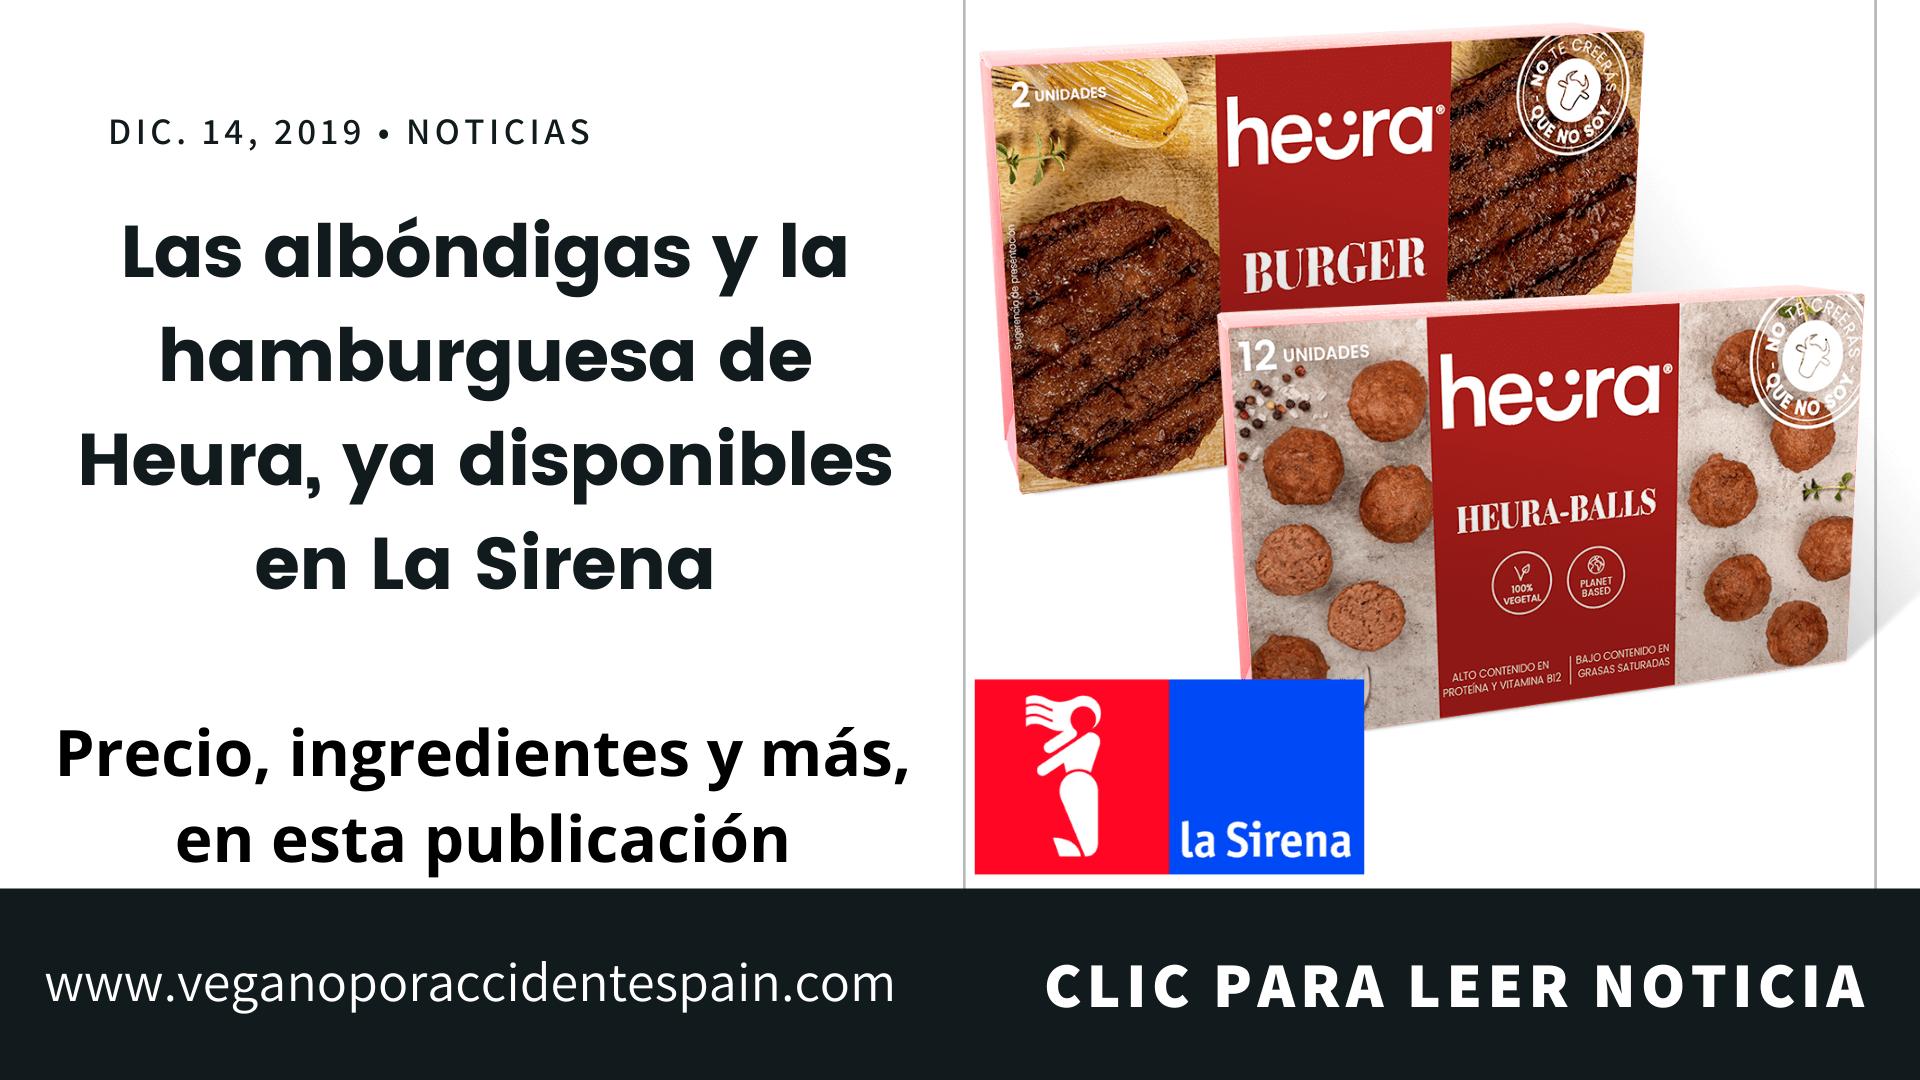 Albondigas y hamburguesa Heura La Sirena